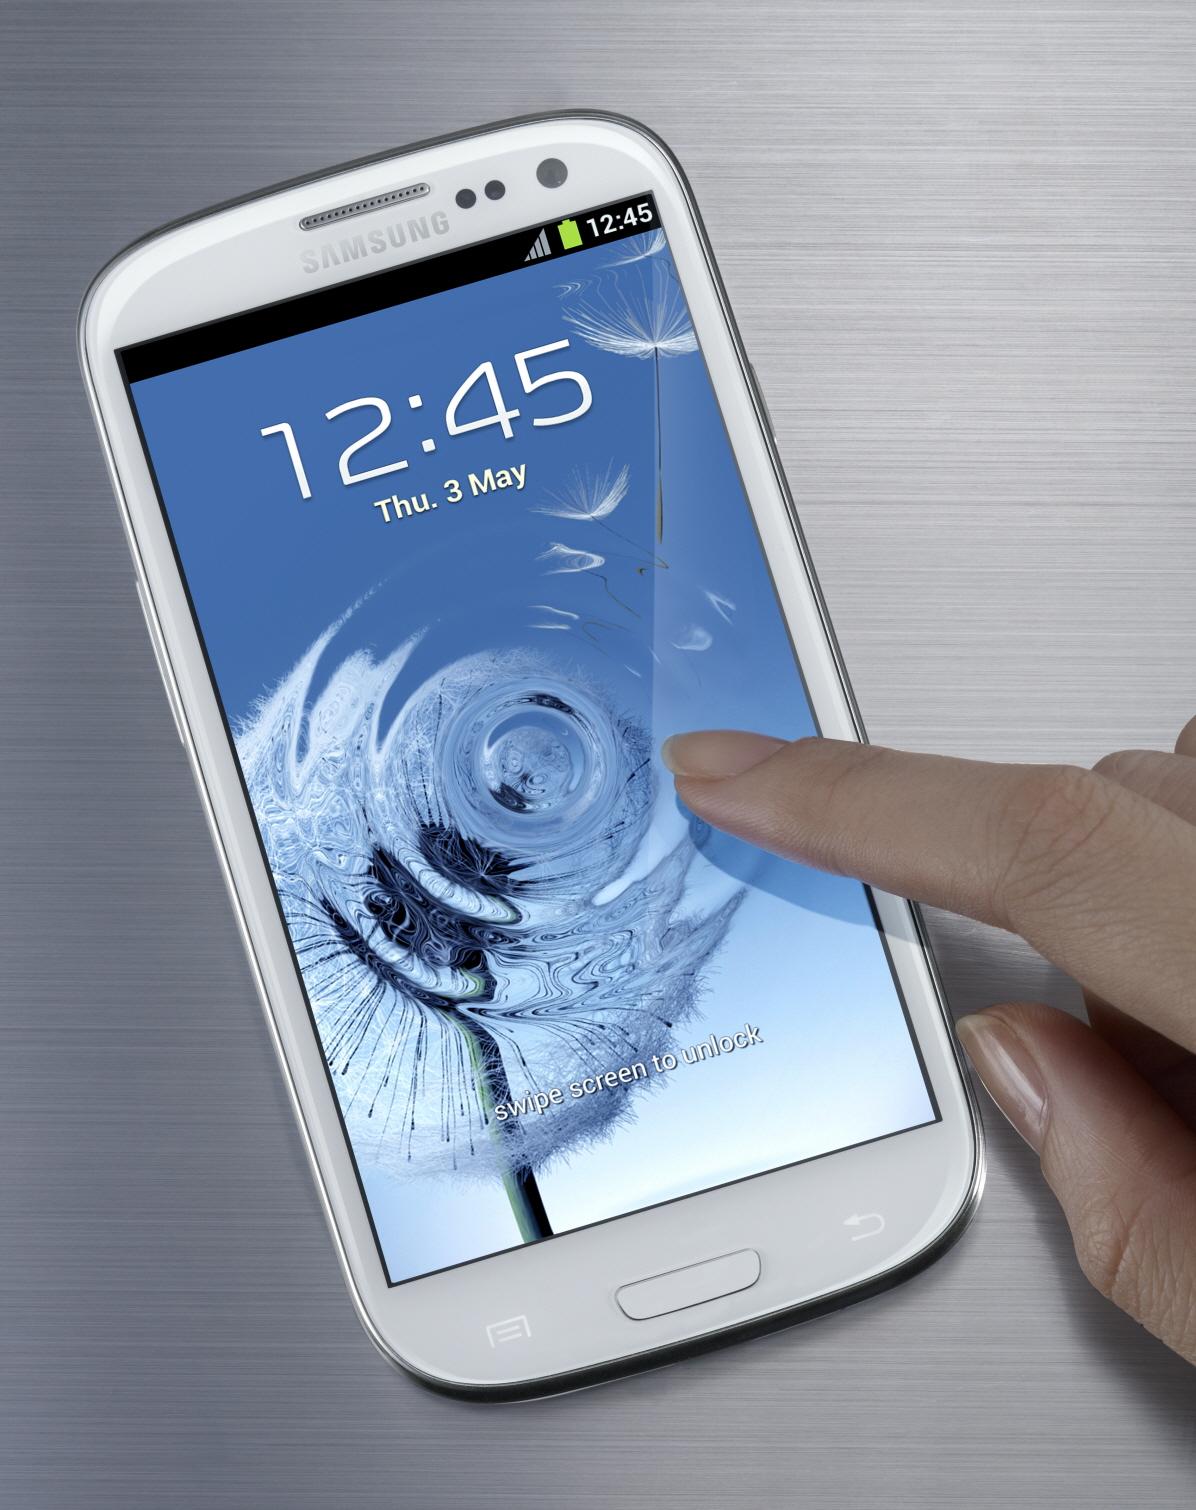 Samsung-Galaxy-S-III-White